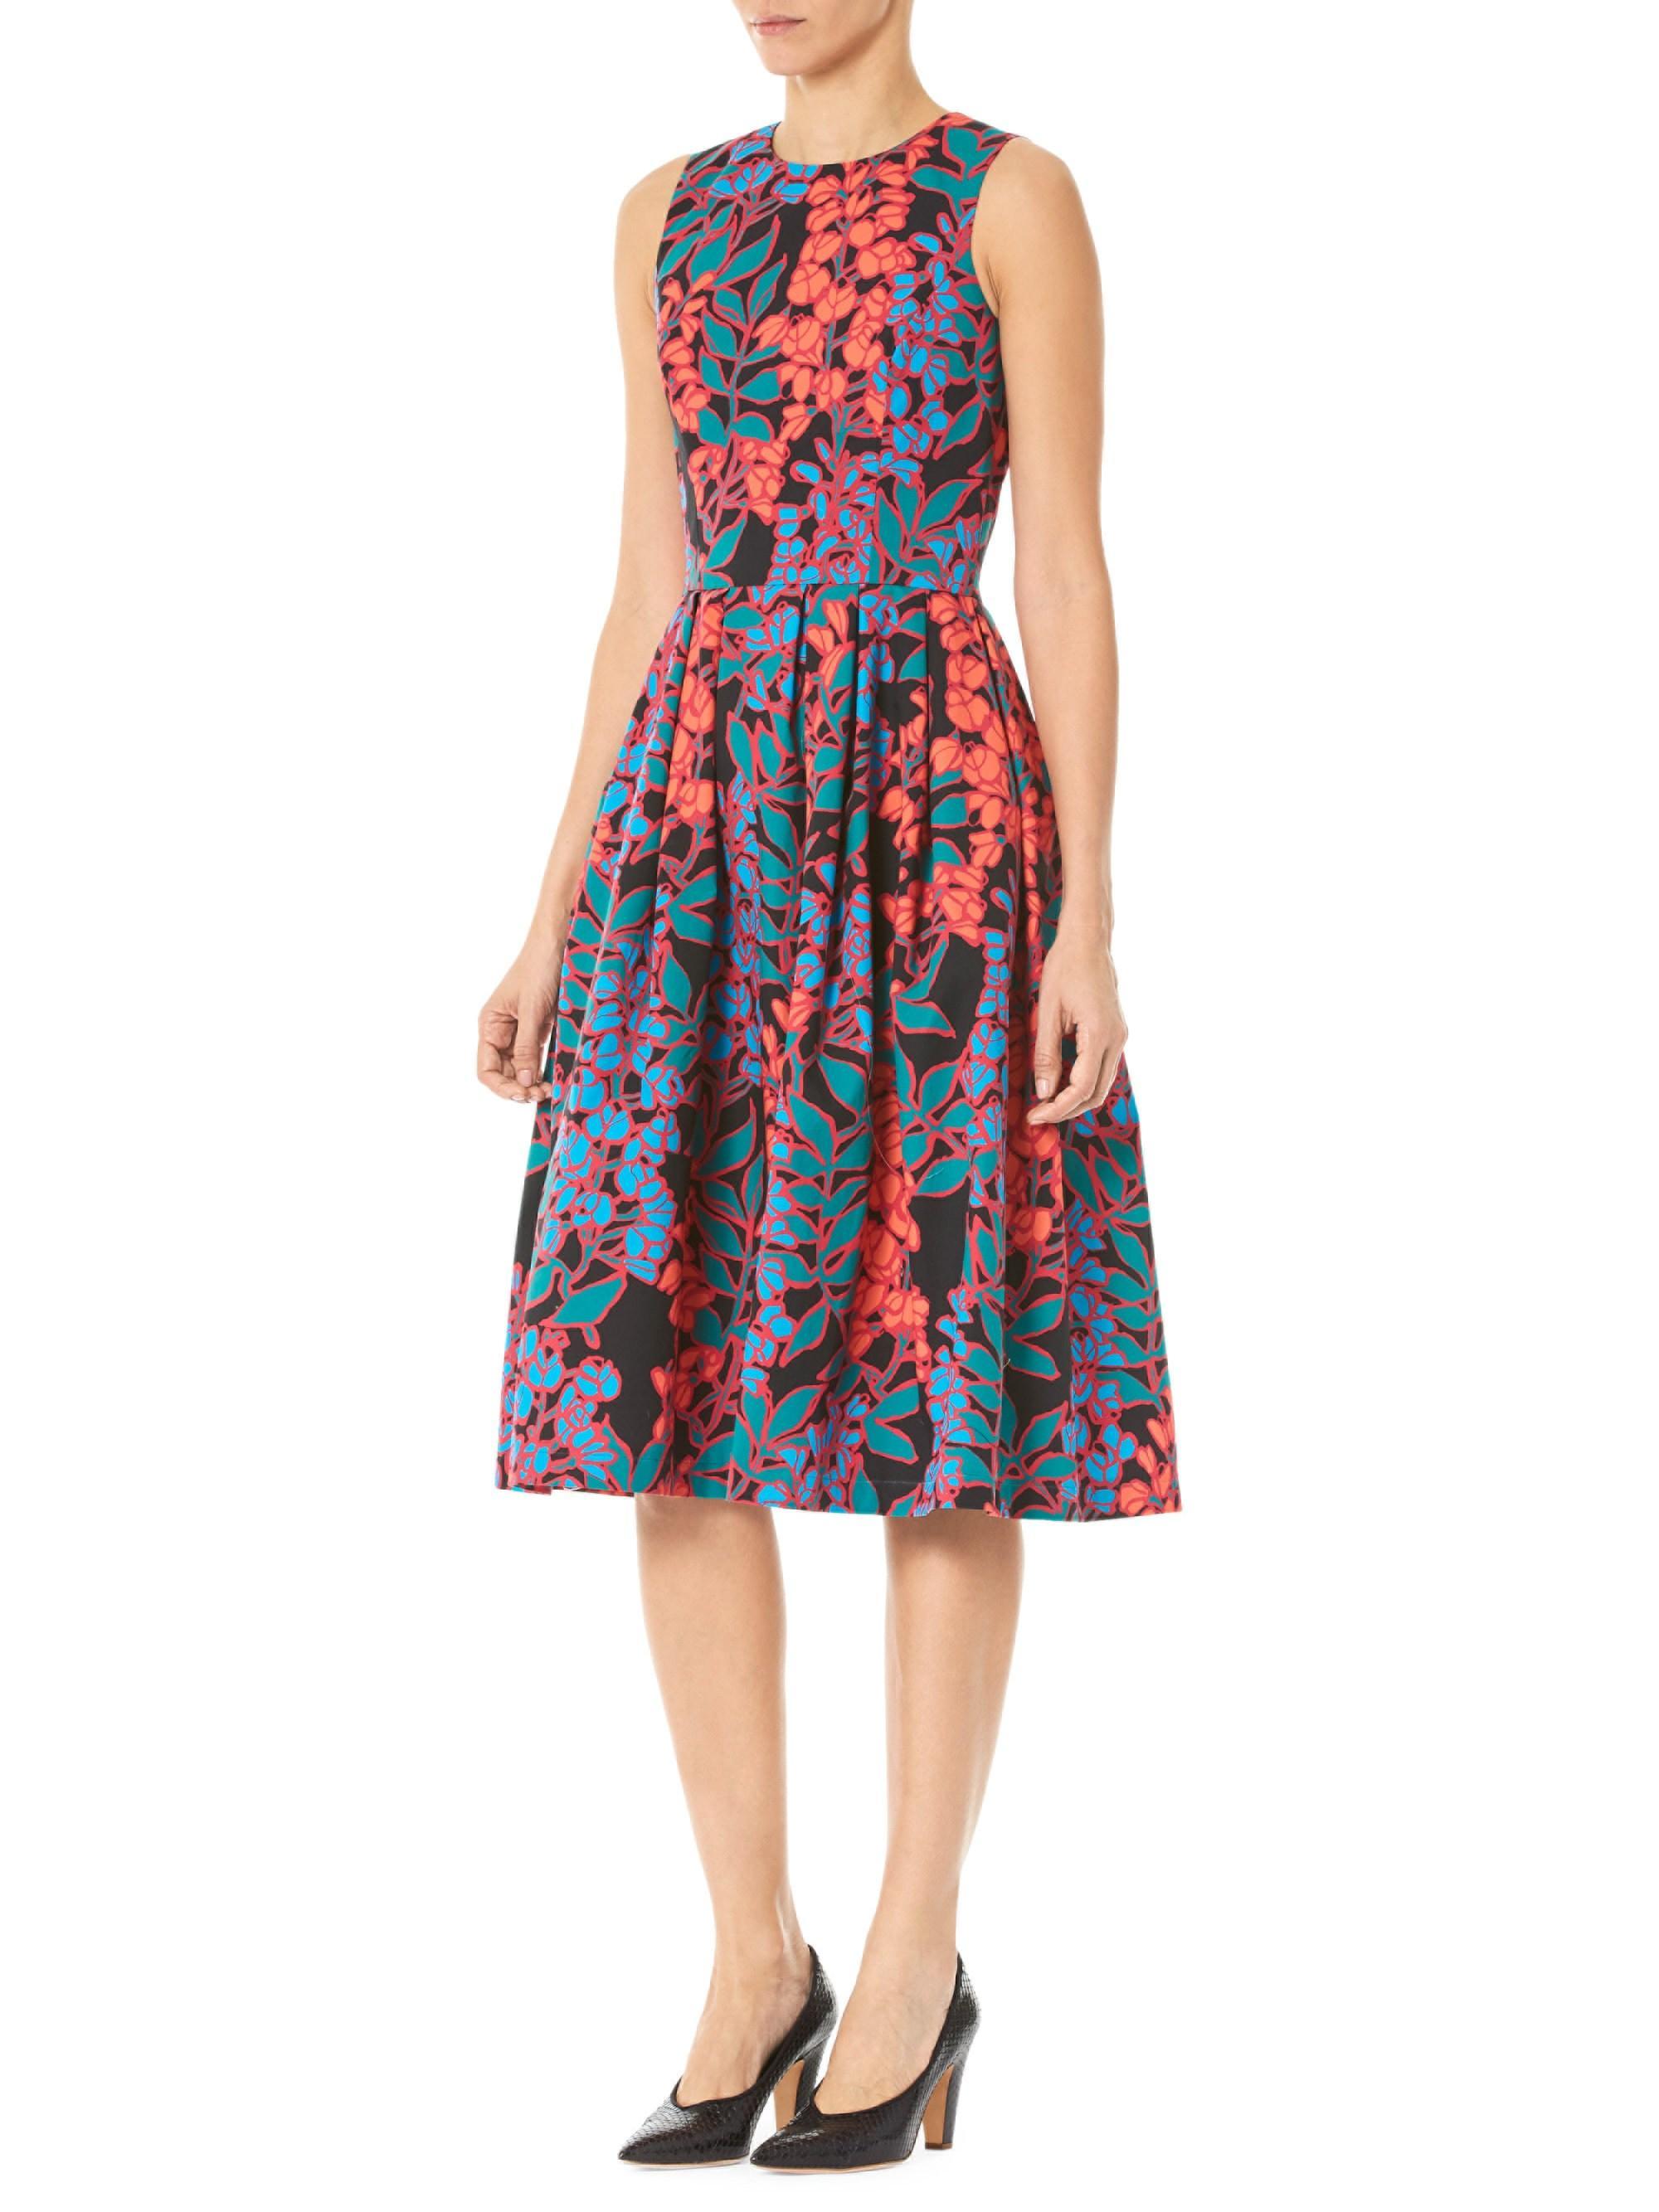 b016acdf54842 Carolina Herrera Women's Sleeveless Floral Tea Dress - Black Multi ...